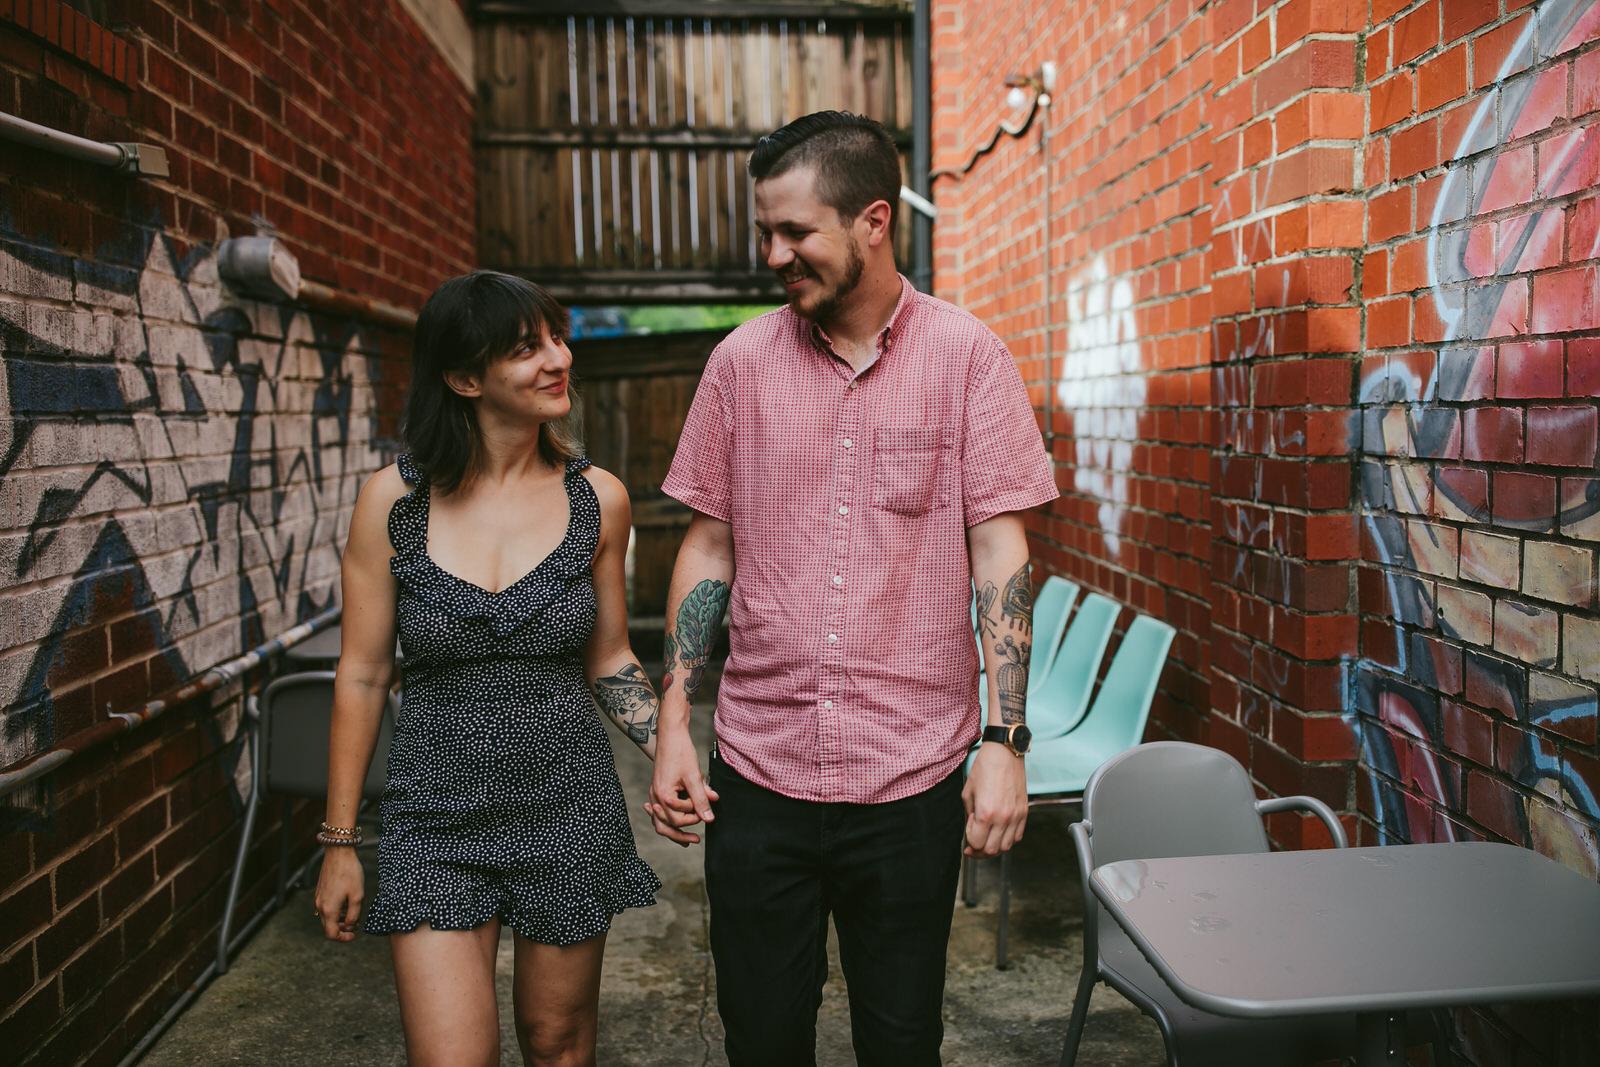 south-florida-couples-photographer-tiny-house-photo-jacksonville-vegans.jpg